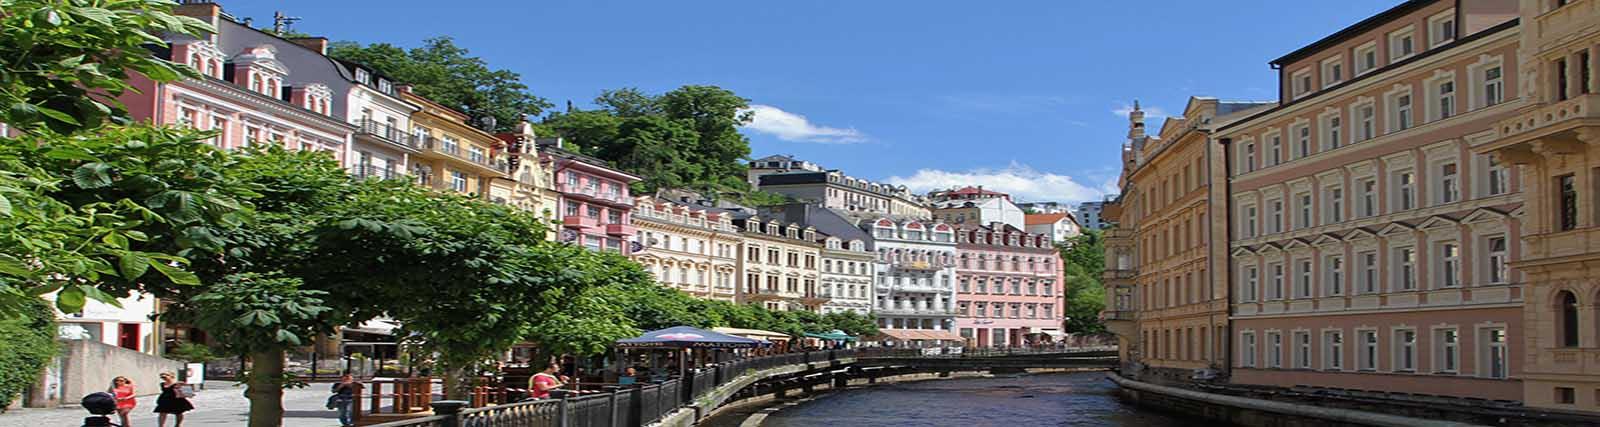 Karlovy-Vary-copy